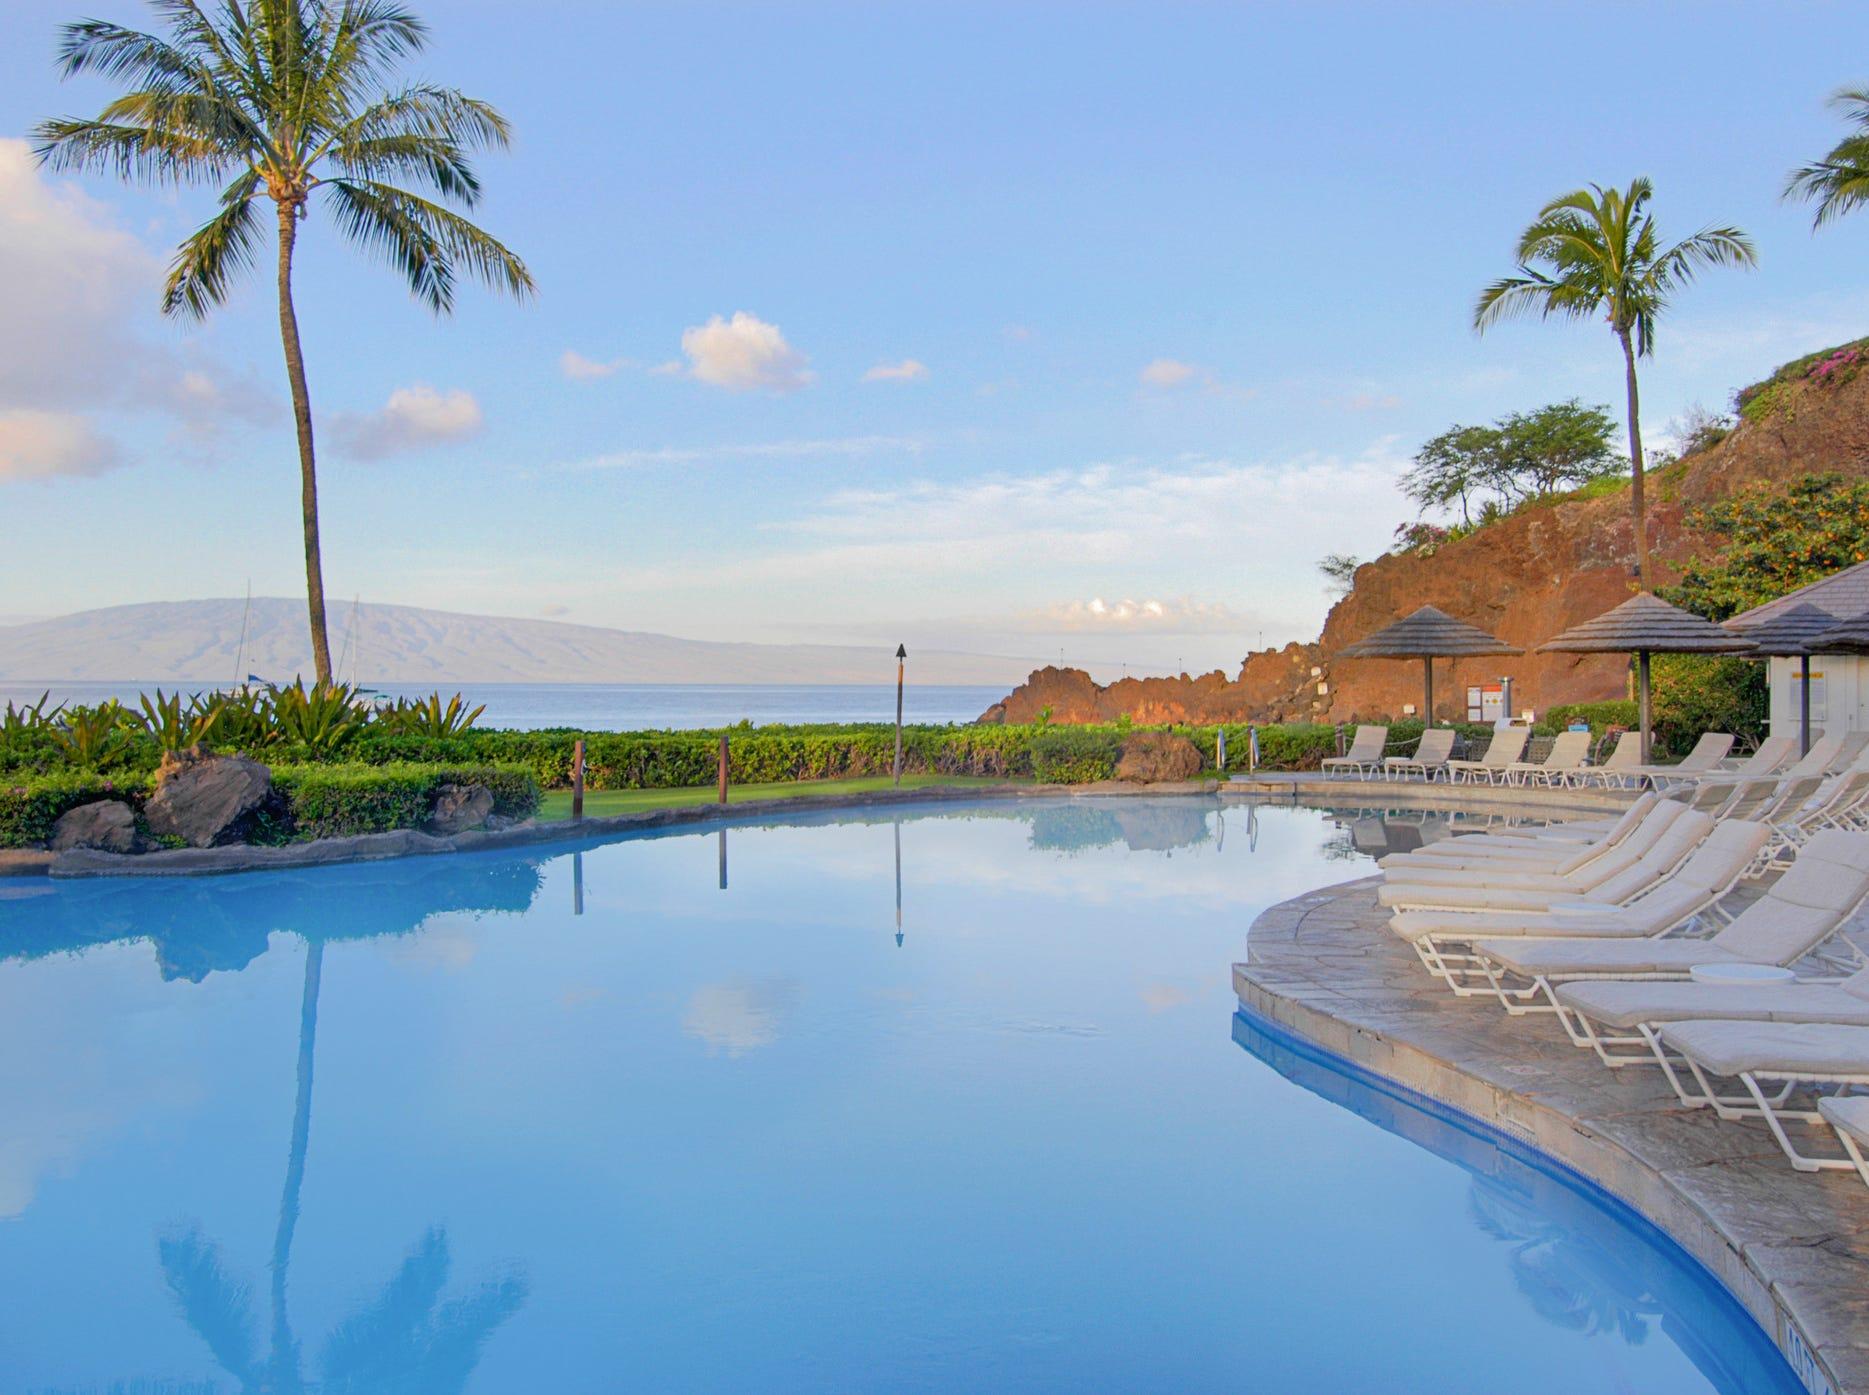 Located on 23 lush oceanfront acres at legendary Pu'u Keka'a on Ka'anapali Beach, Sheraton Maui Resort & Spa invites travelers to experience adventure, romance and family fun on the island of Maui.